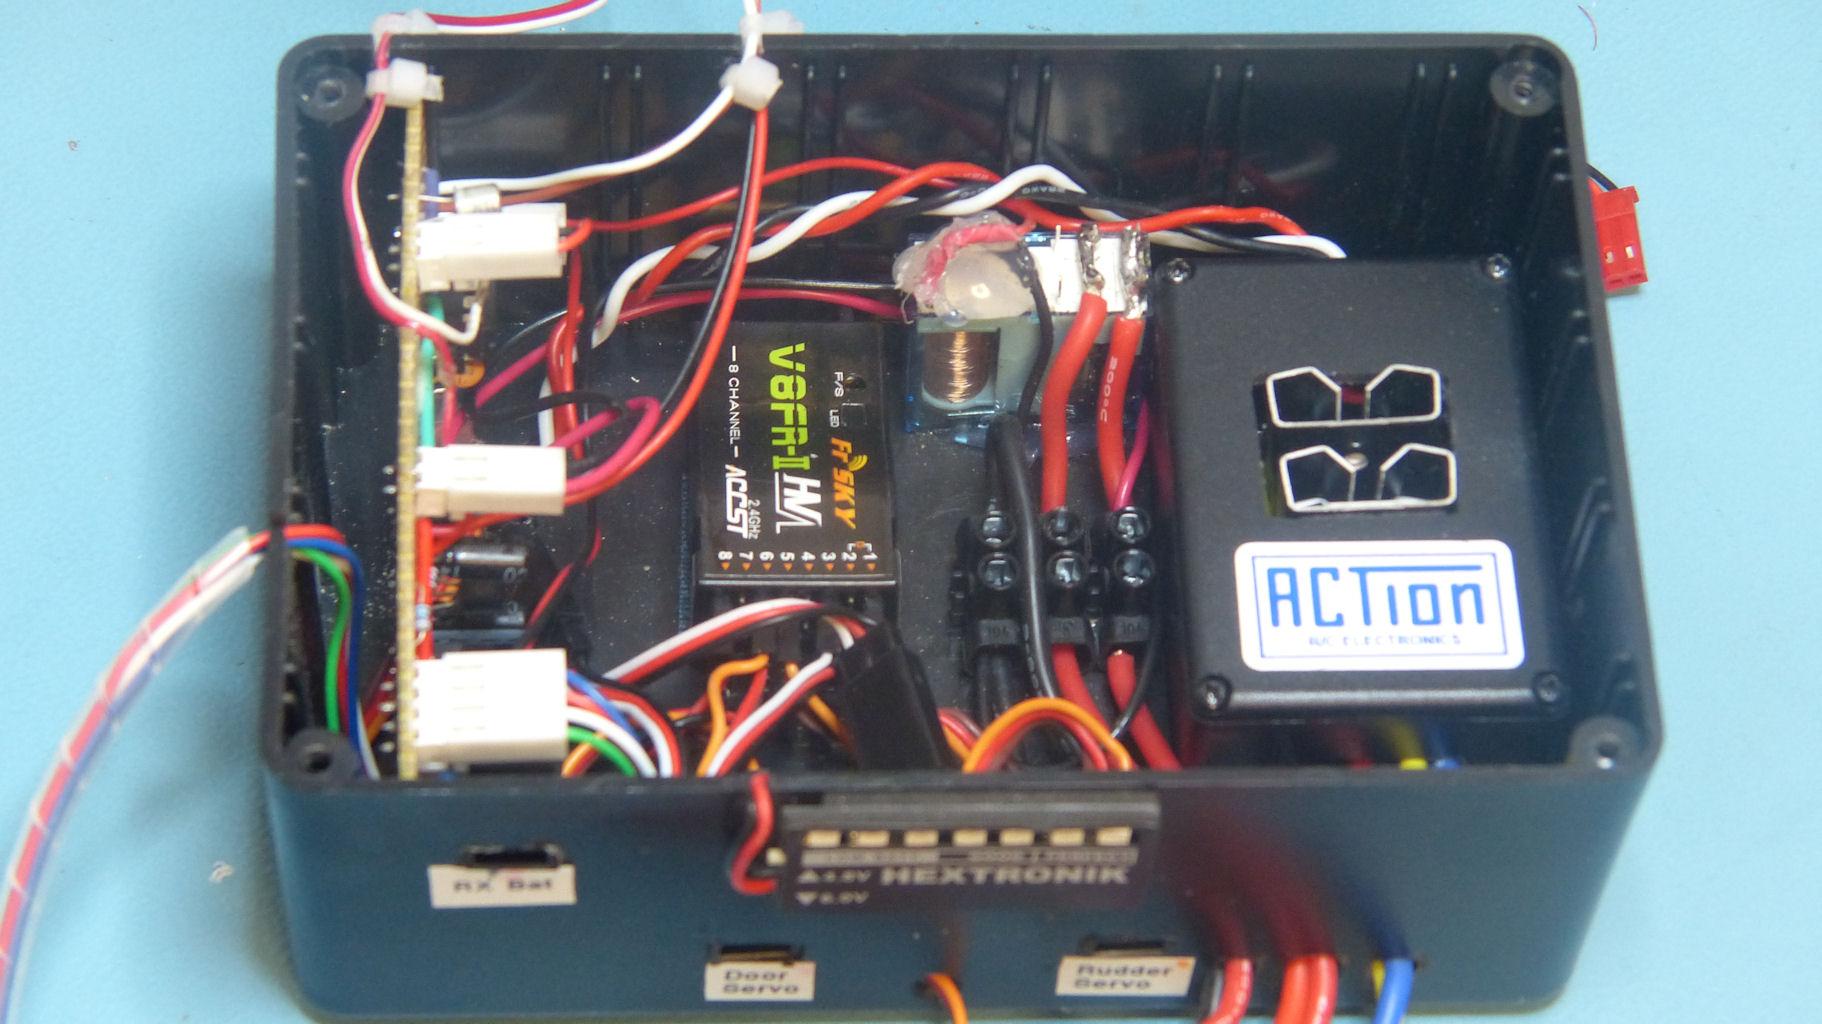 [DIAGRAM_38DE]  XB_0834] Marine Wiring Supplies Uk Free Diagram | Viper Bait Boat Wiring Diagram |  | Tomy Shopa Mohammedshrine Librar Wiring 101